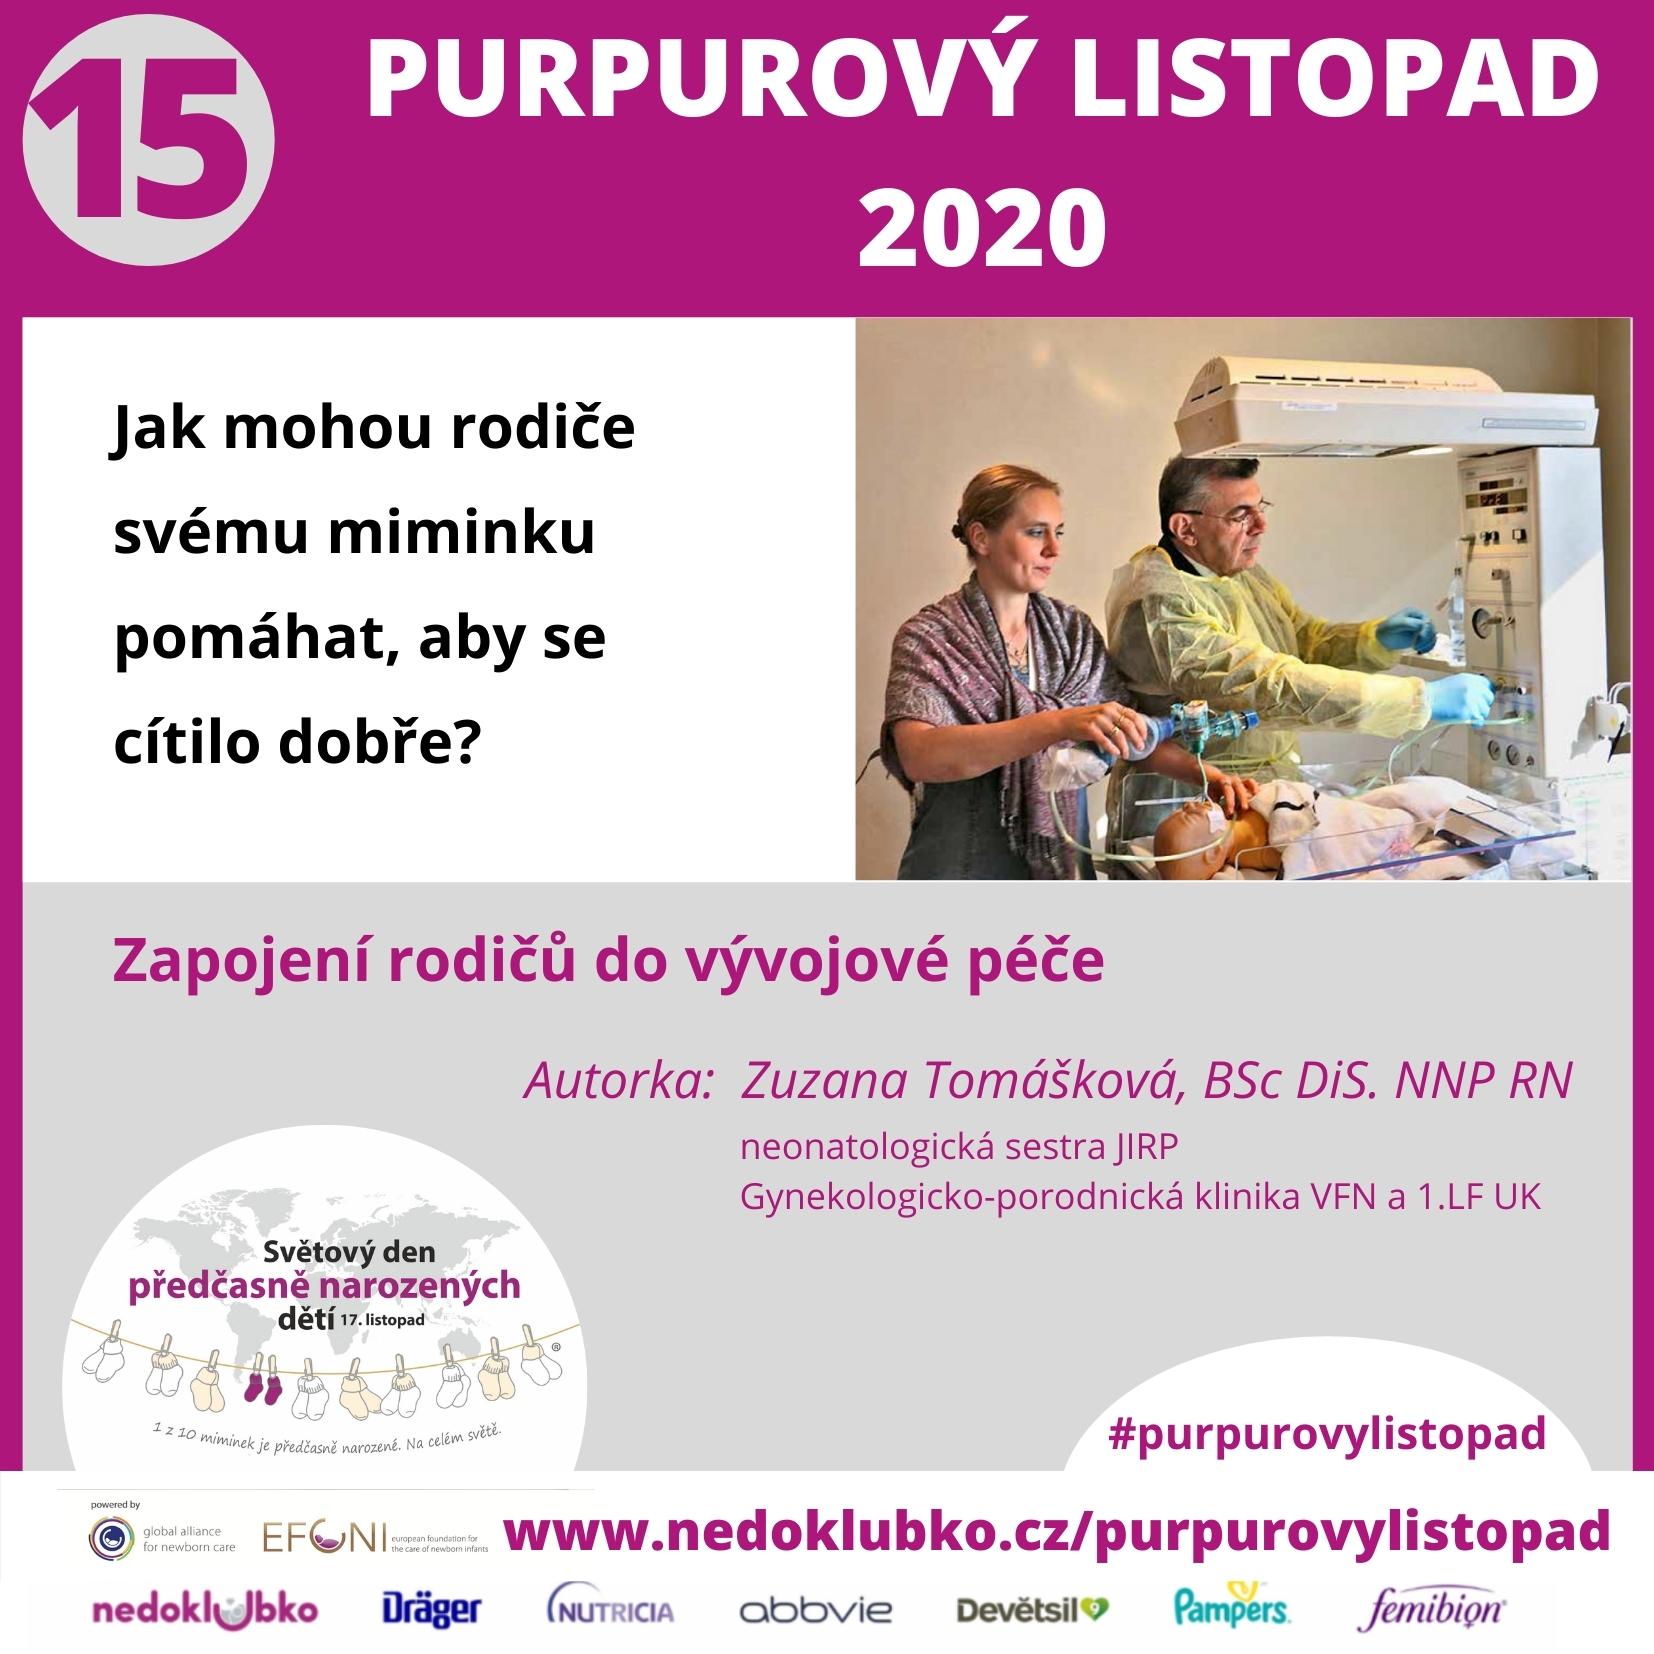 Kopie návrhu Purpurový listopad Řežábková